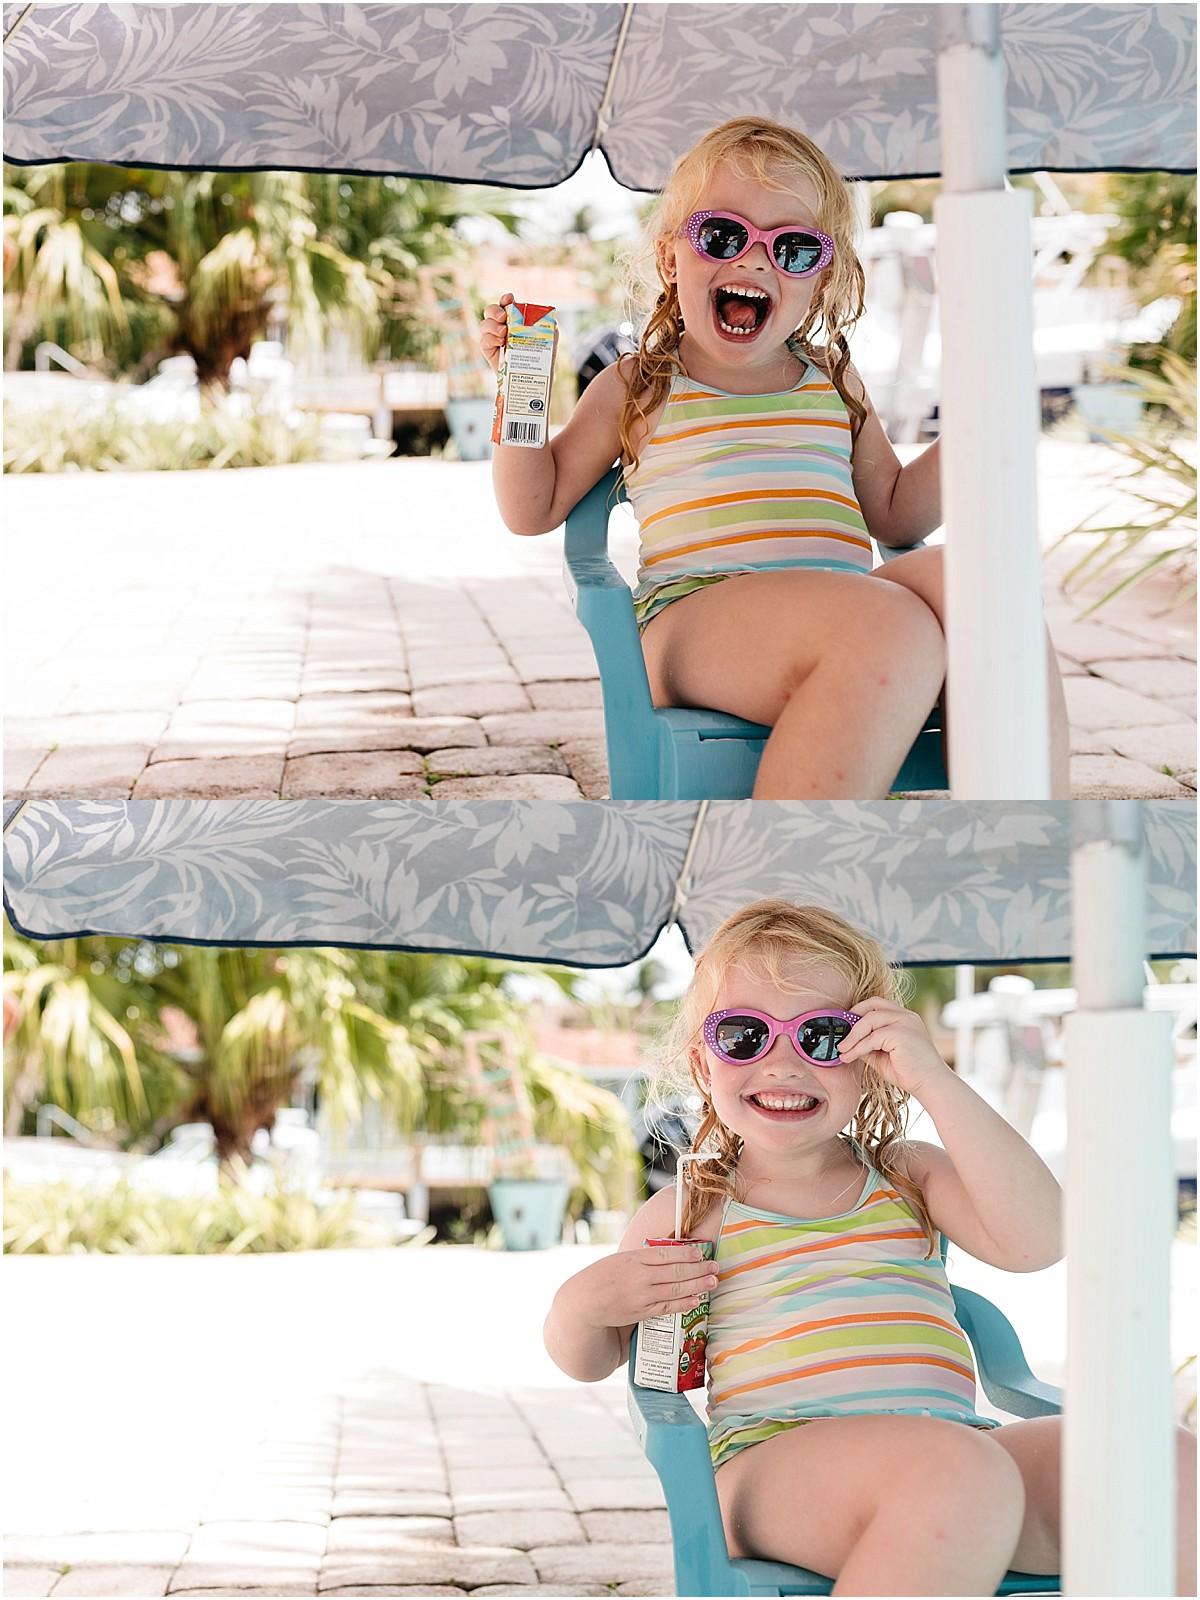 Ashley_Rogers_Photography_South_Florida_Photographer_Orlando_Photographer_Costa_Rica_Photographer_0789.jpg